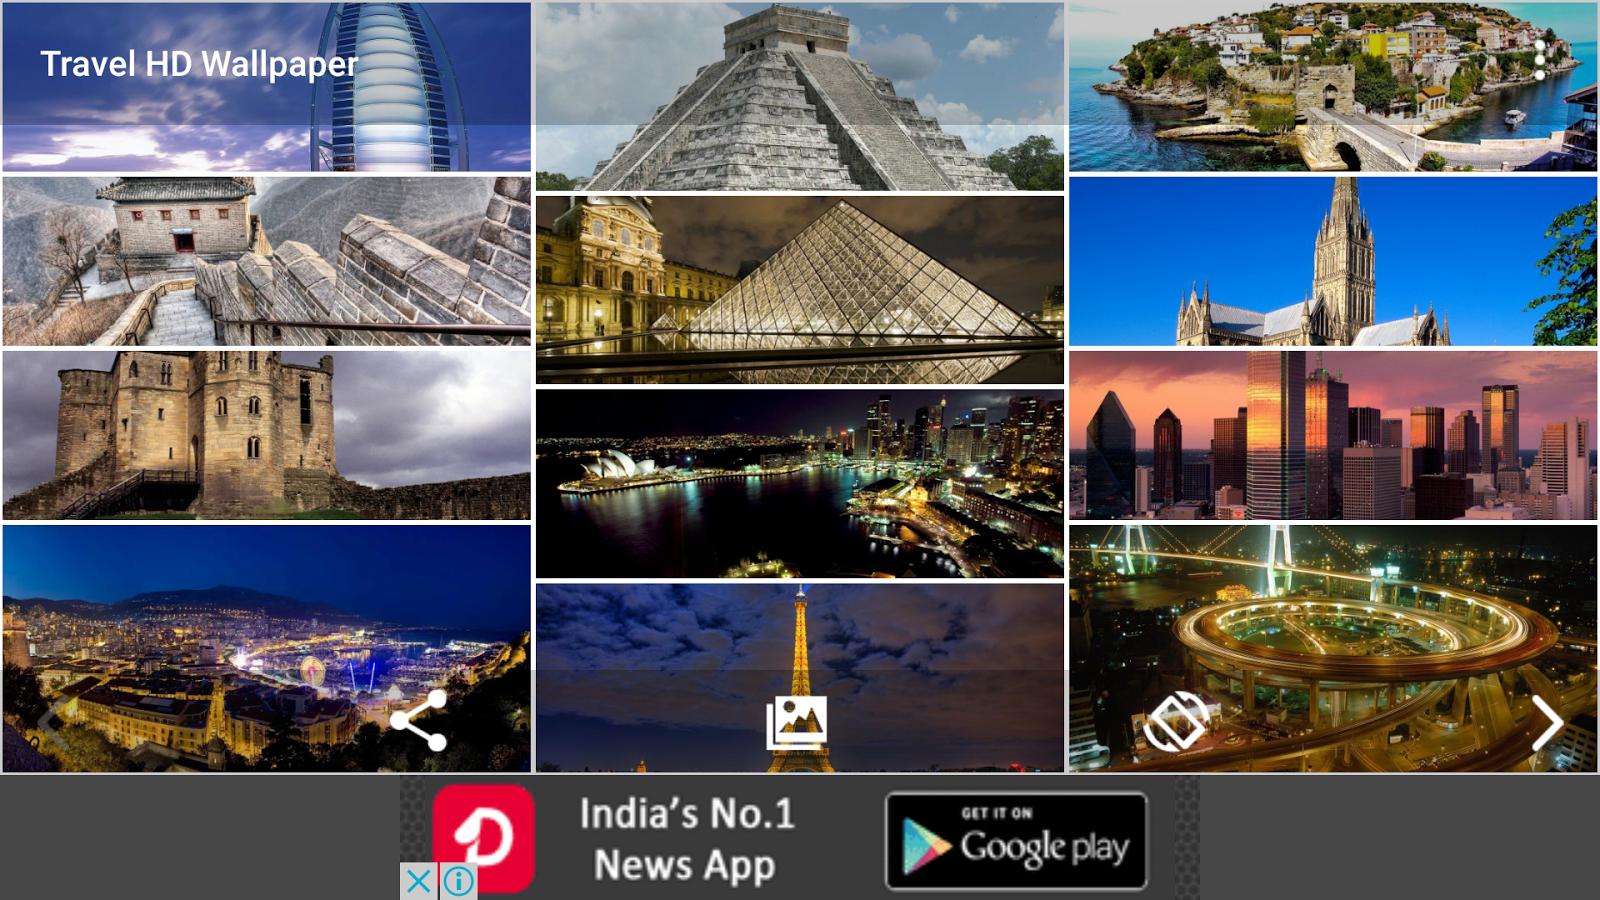 Hd wallpaper travel - Travel Hd Wallpaper Screenshot